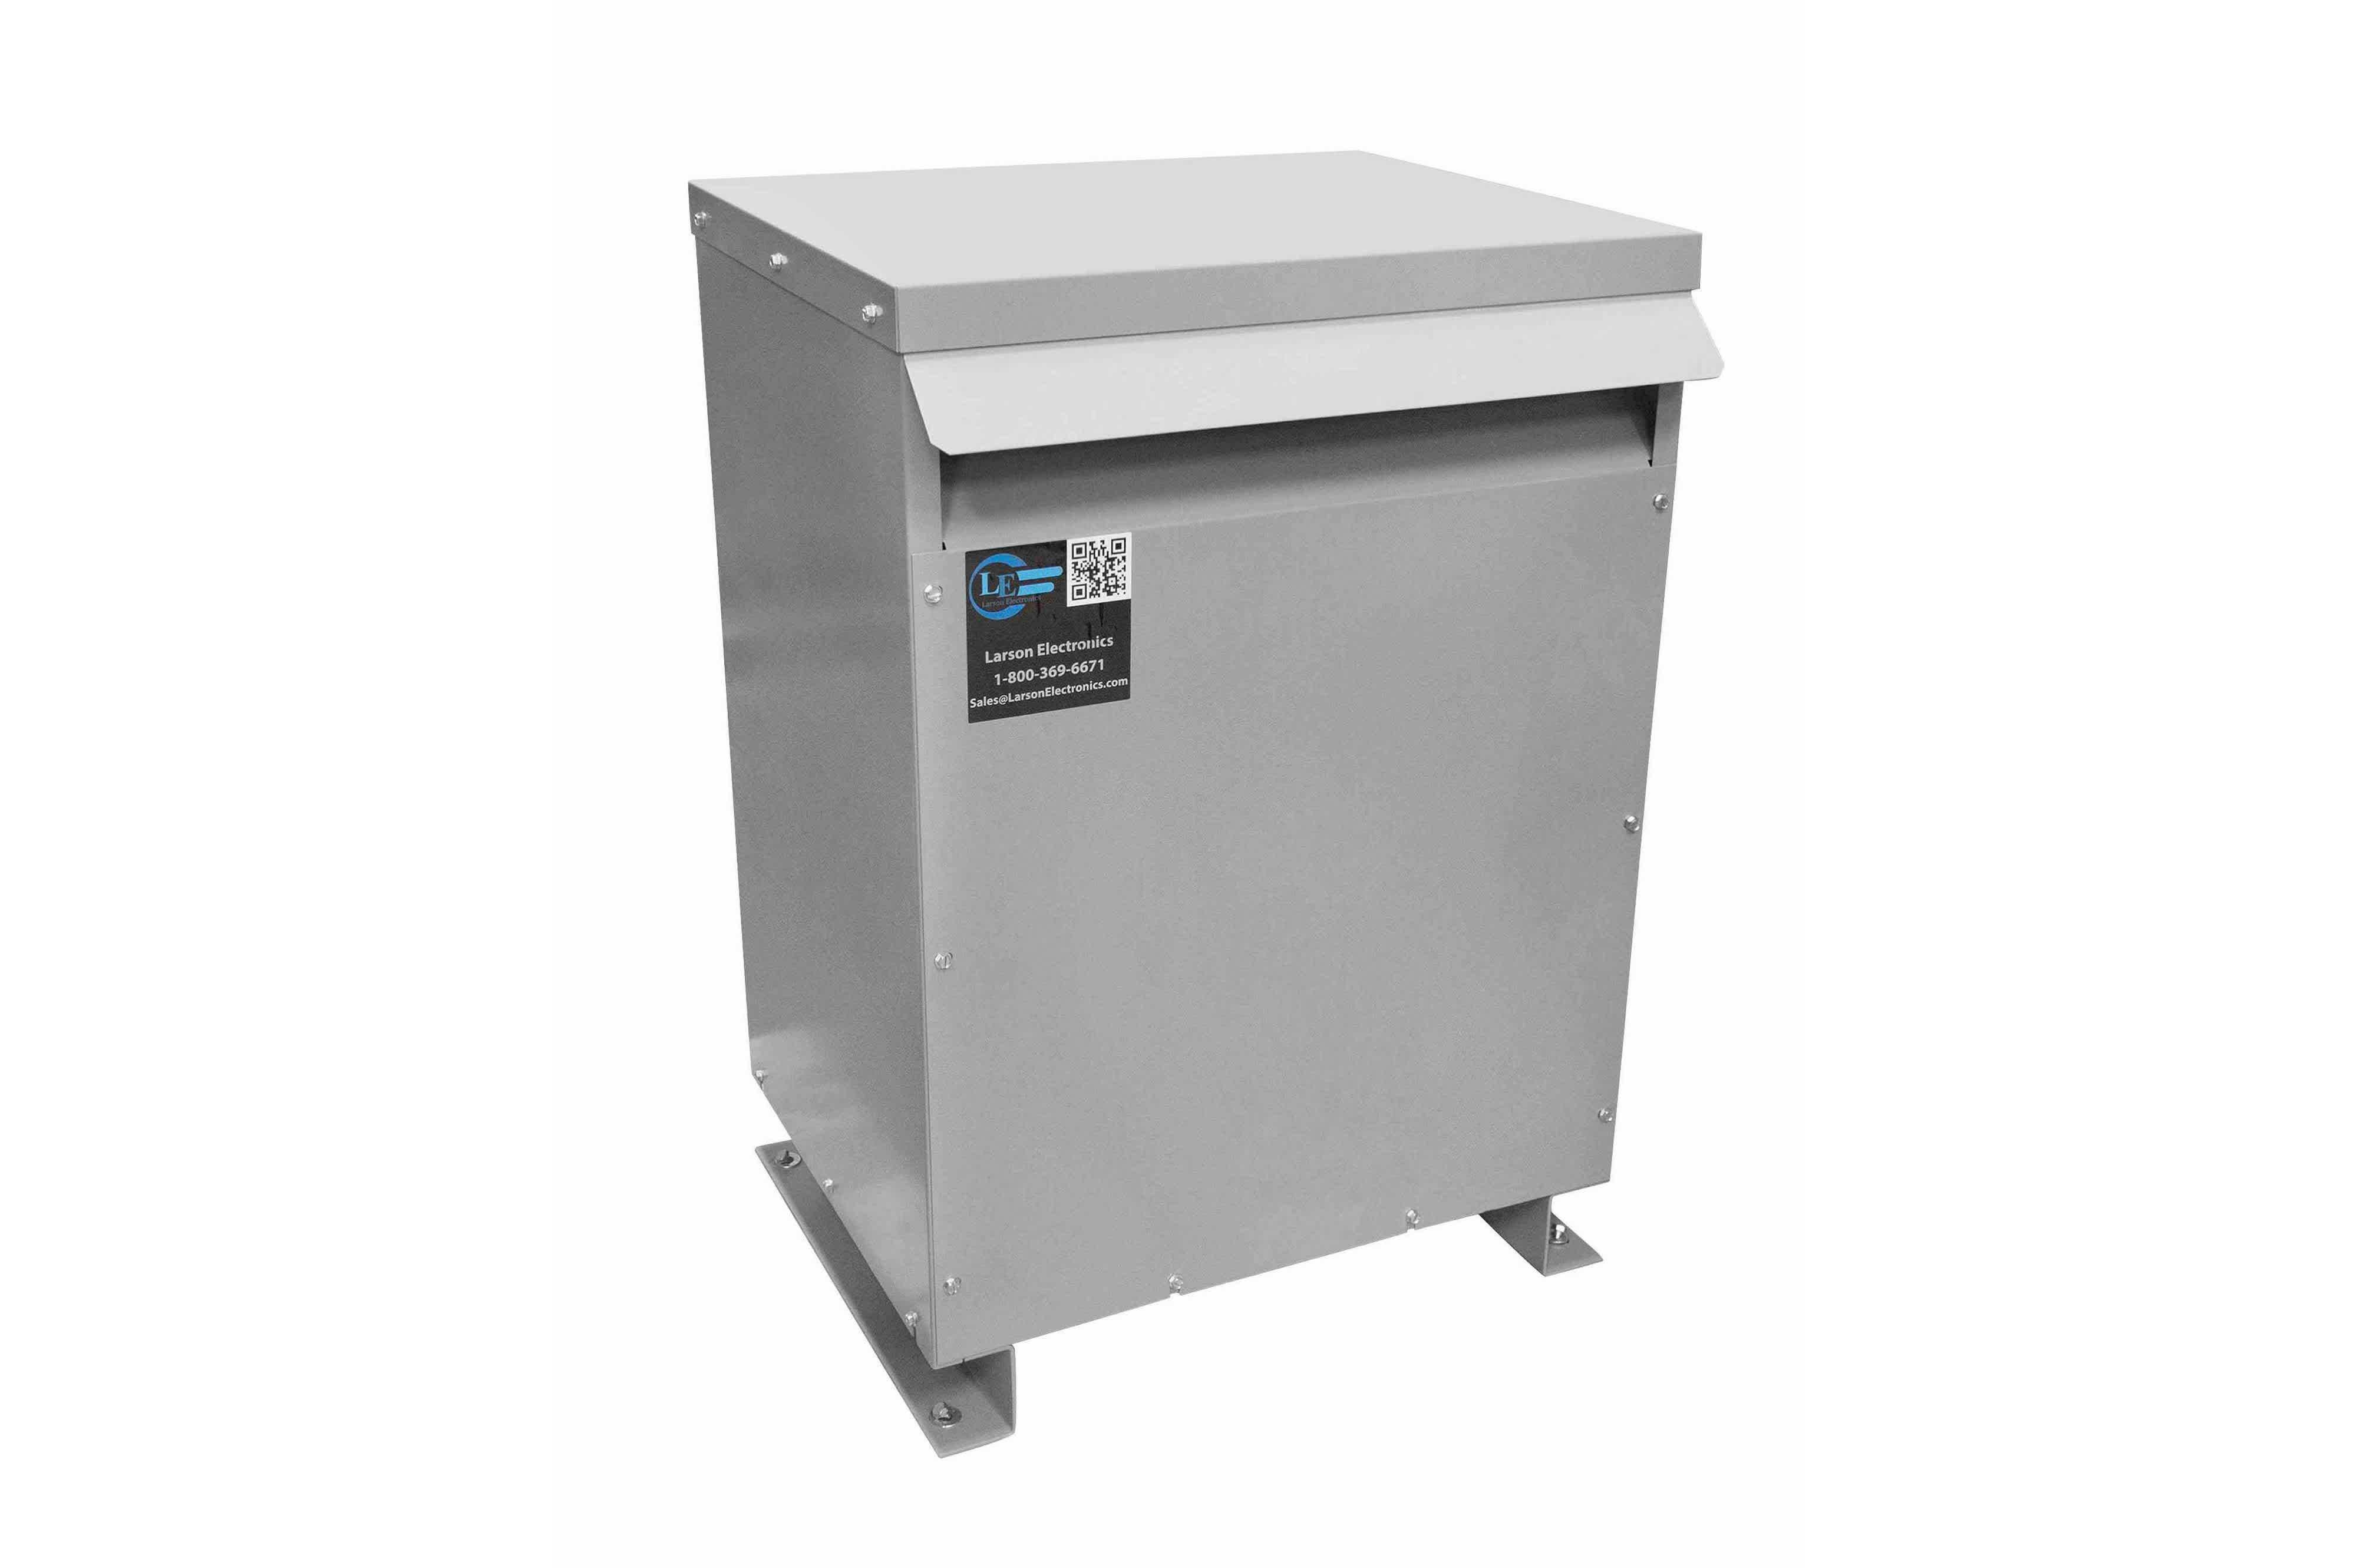 70 kVA 3PH Isolation Transformer, 380V Wye Primary, 600Y/347 Wye-N Secondary, N3R, Ventilated, 60 Hz